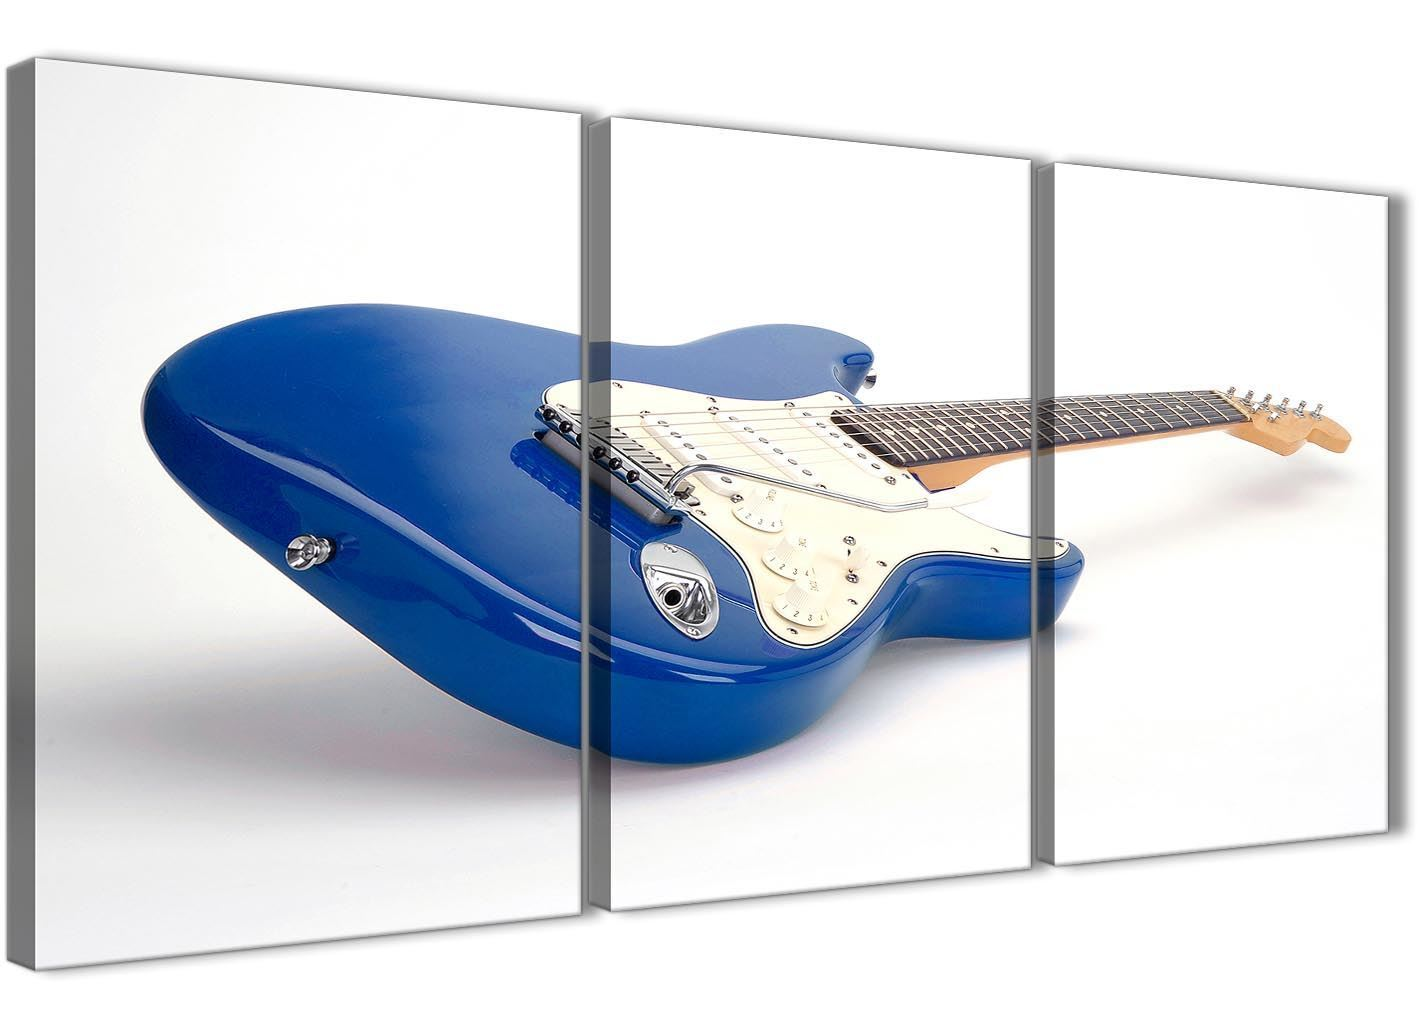 Panel blau weiß fender electric guitar office office guitar